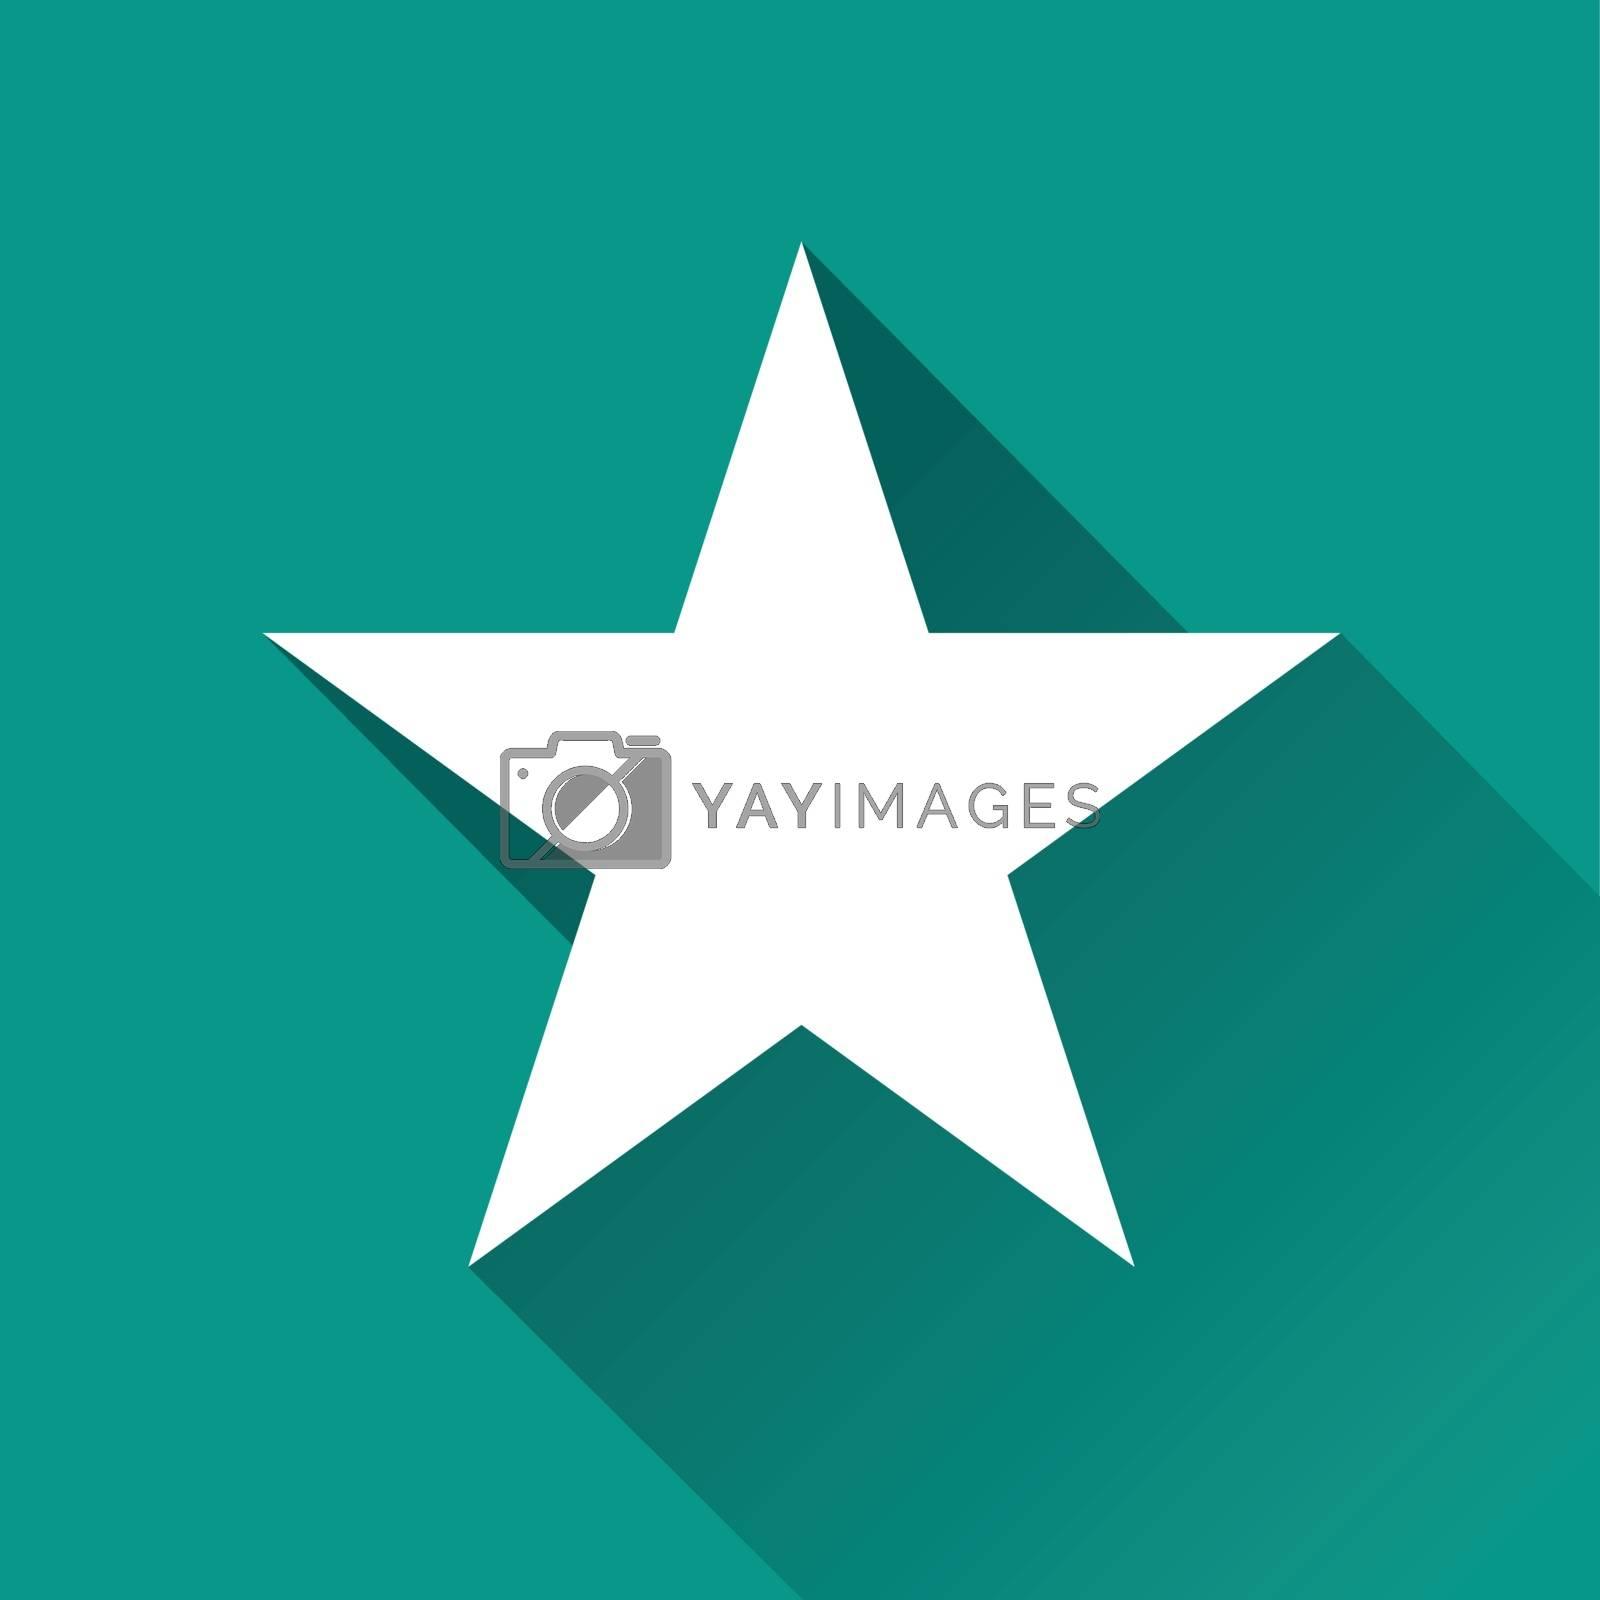 illustration of star flat design icon isolated